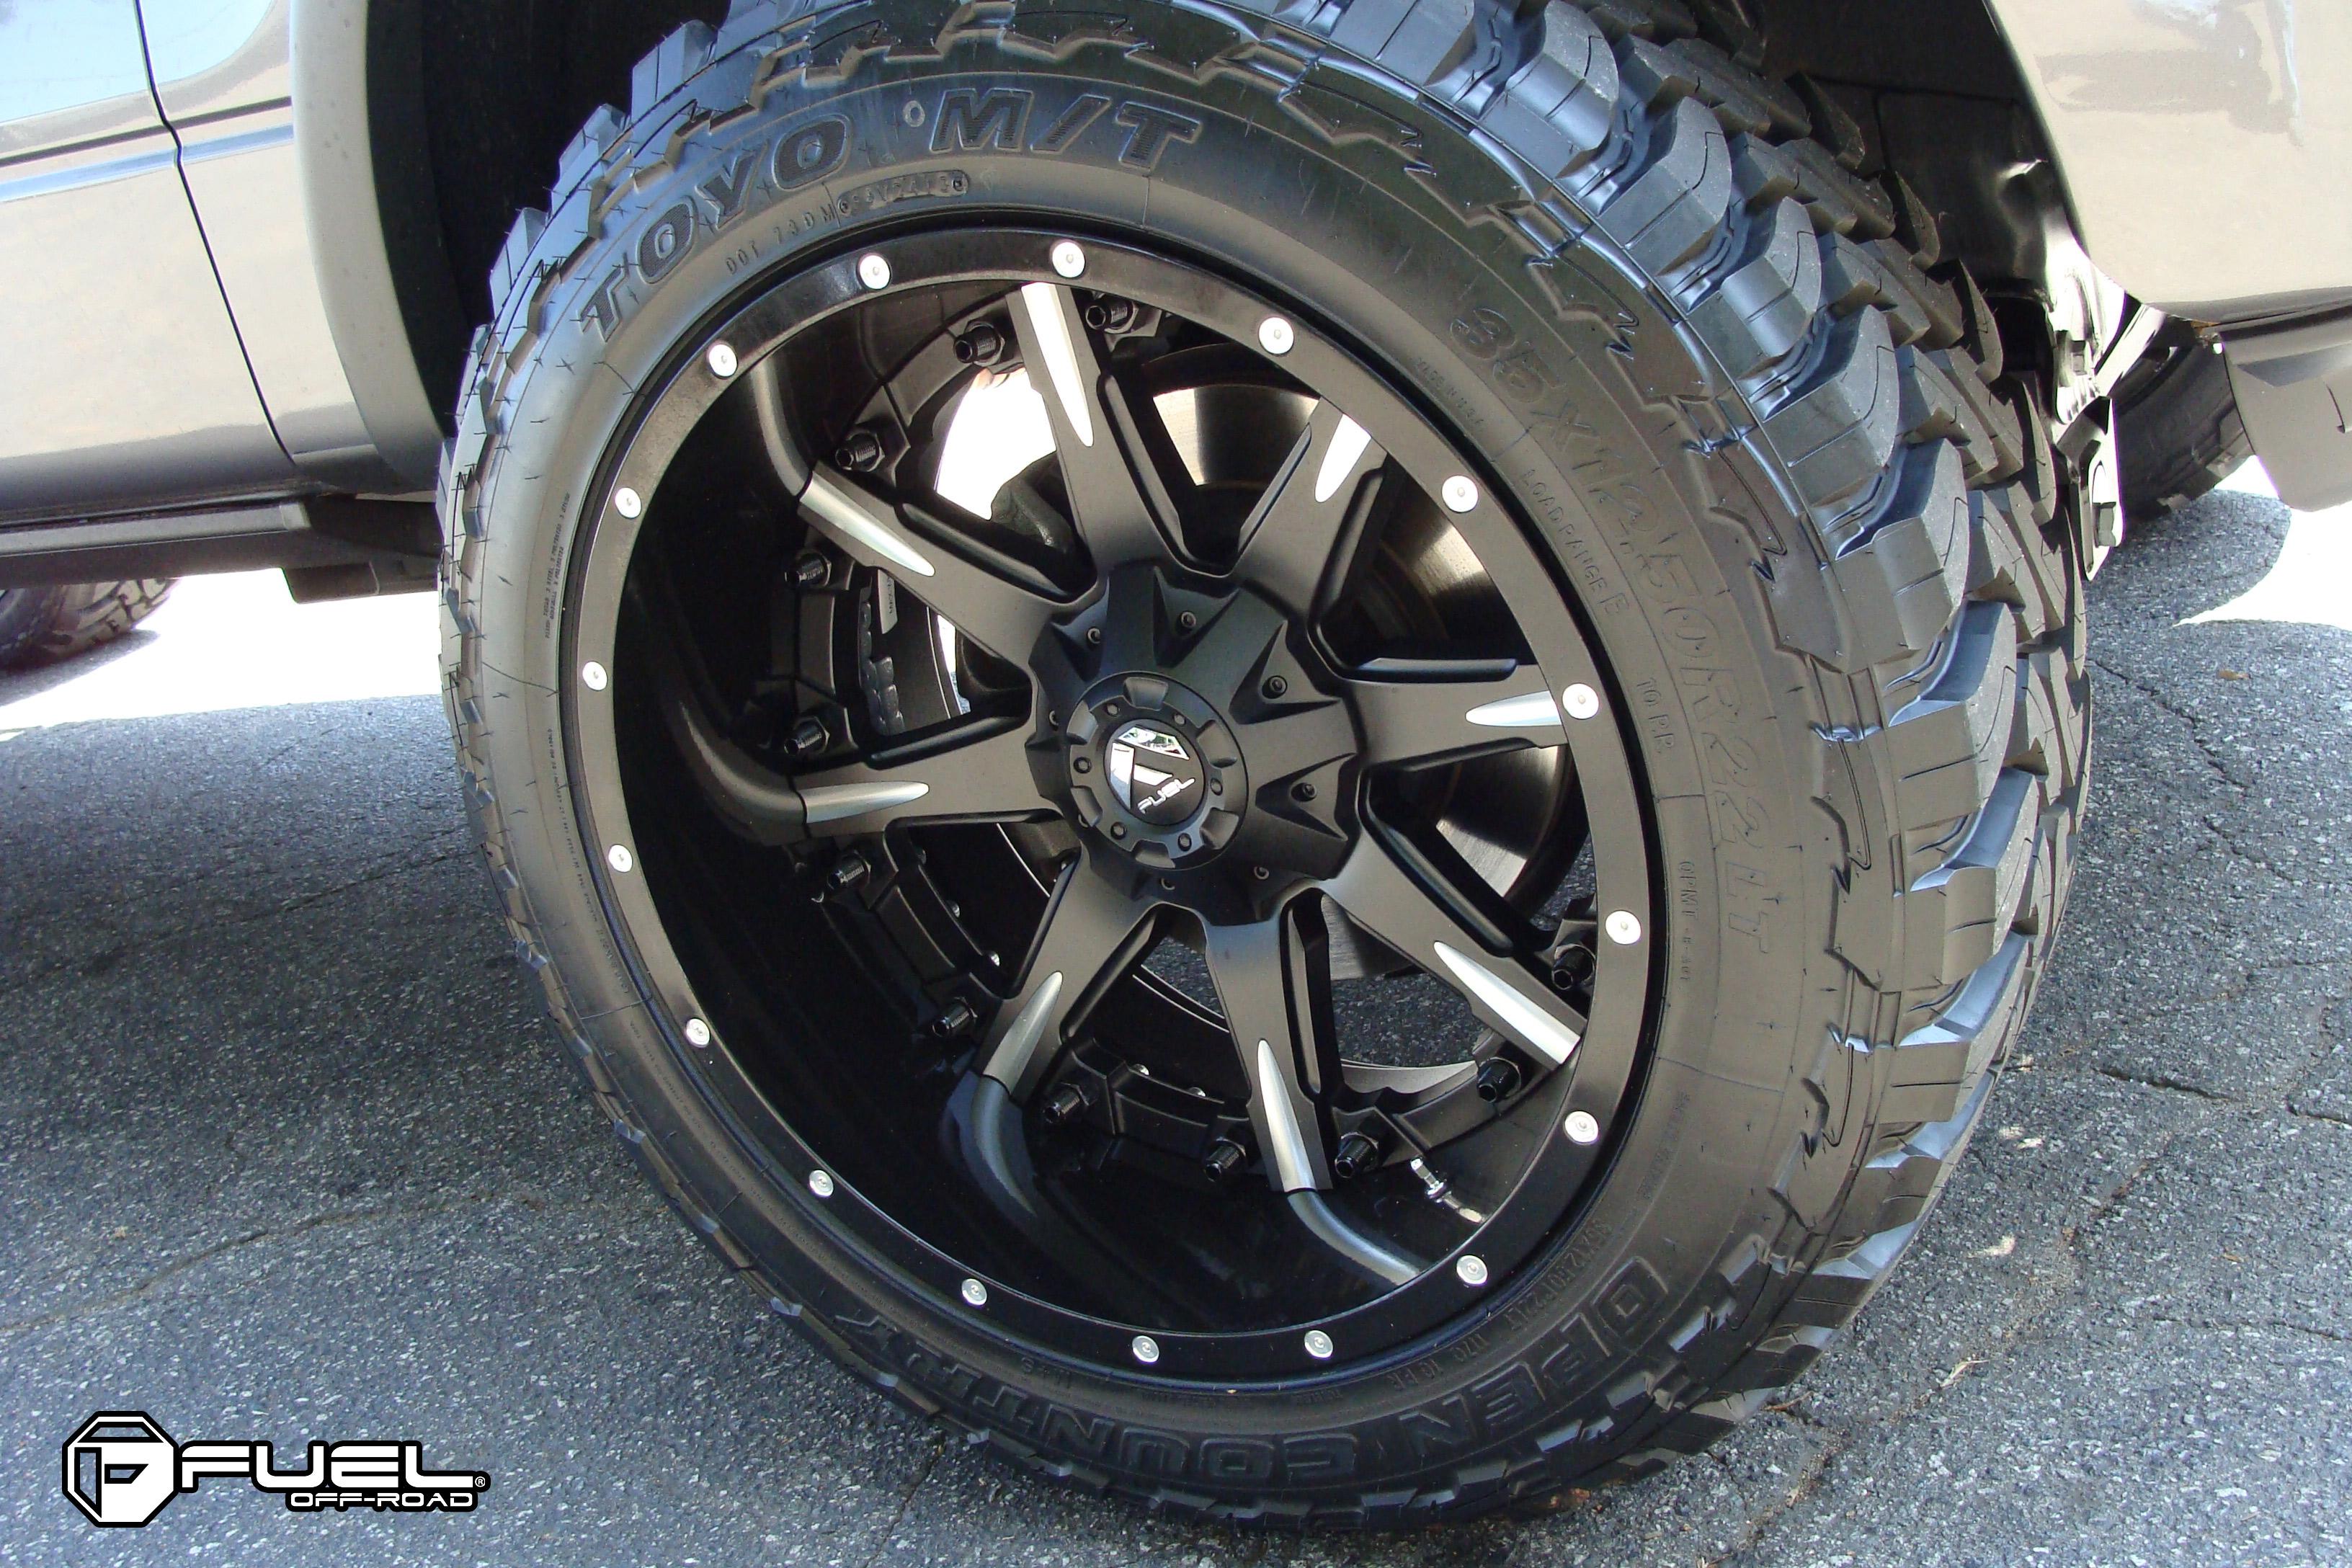 Ford F-150 Nutz - D251 Gallery - Fuel Off-Road Wheels